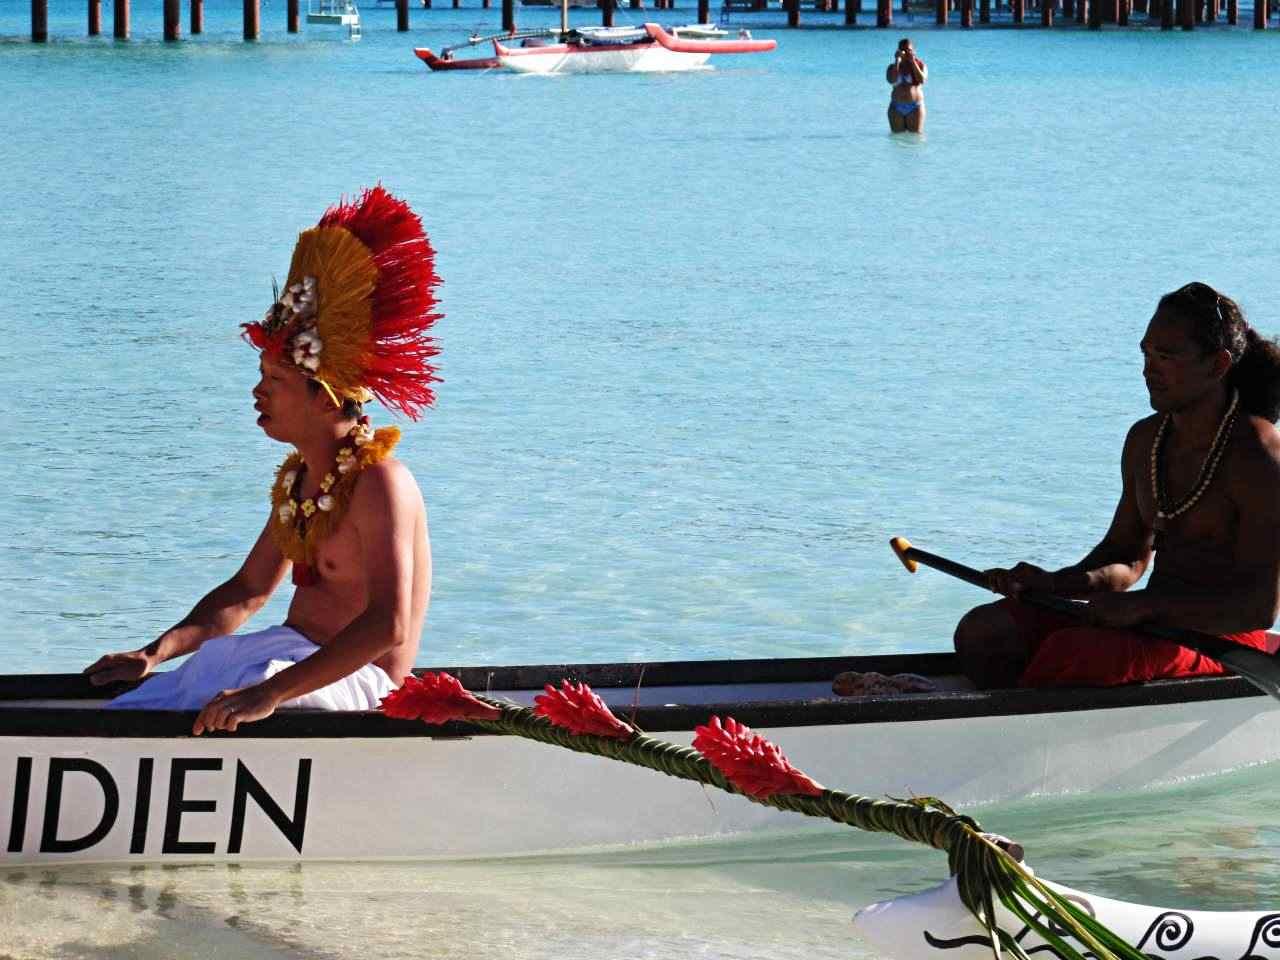 Casamento Típico Bora Bora - Polinesia Francesa